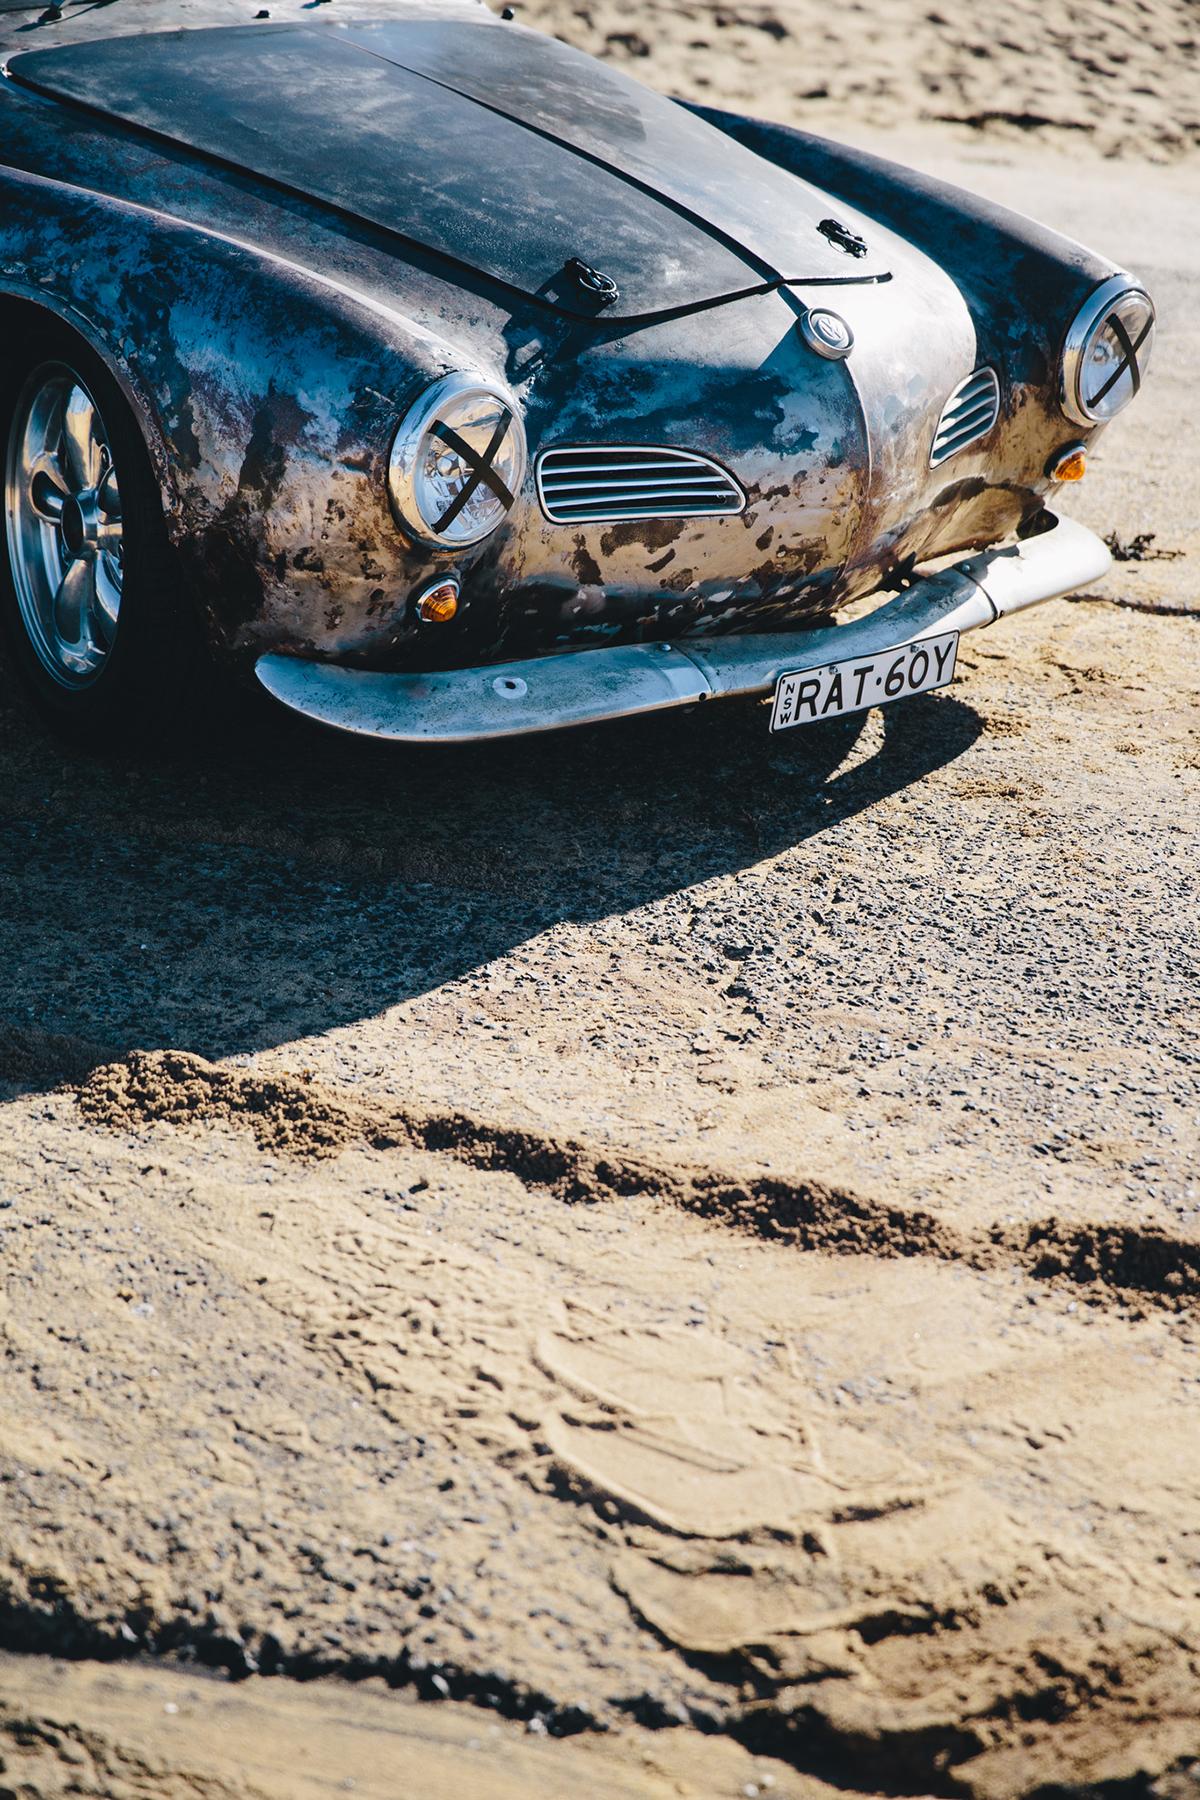 Volkswagen_Karmann _Ghia_Rat20160725 (1)